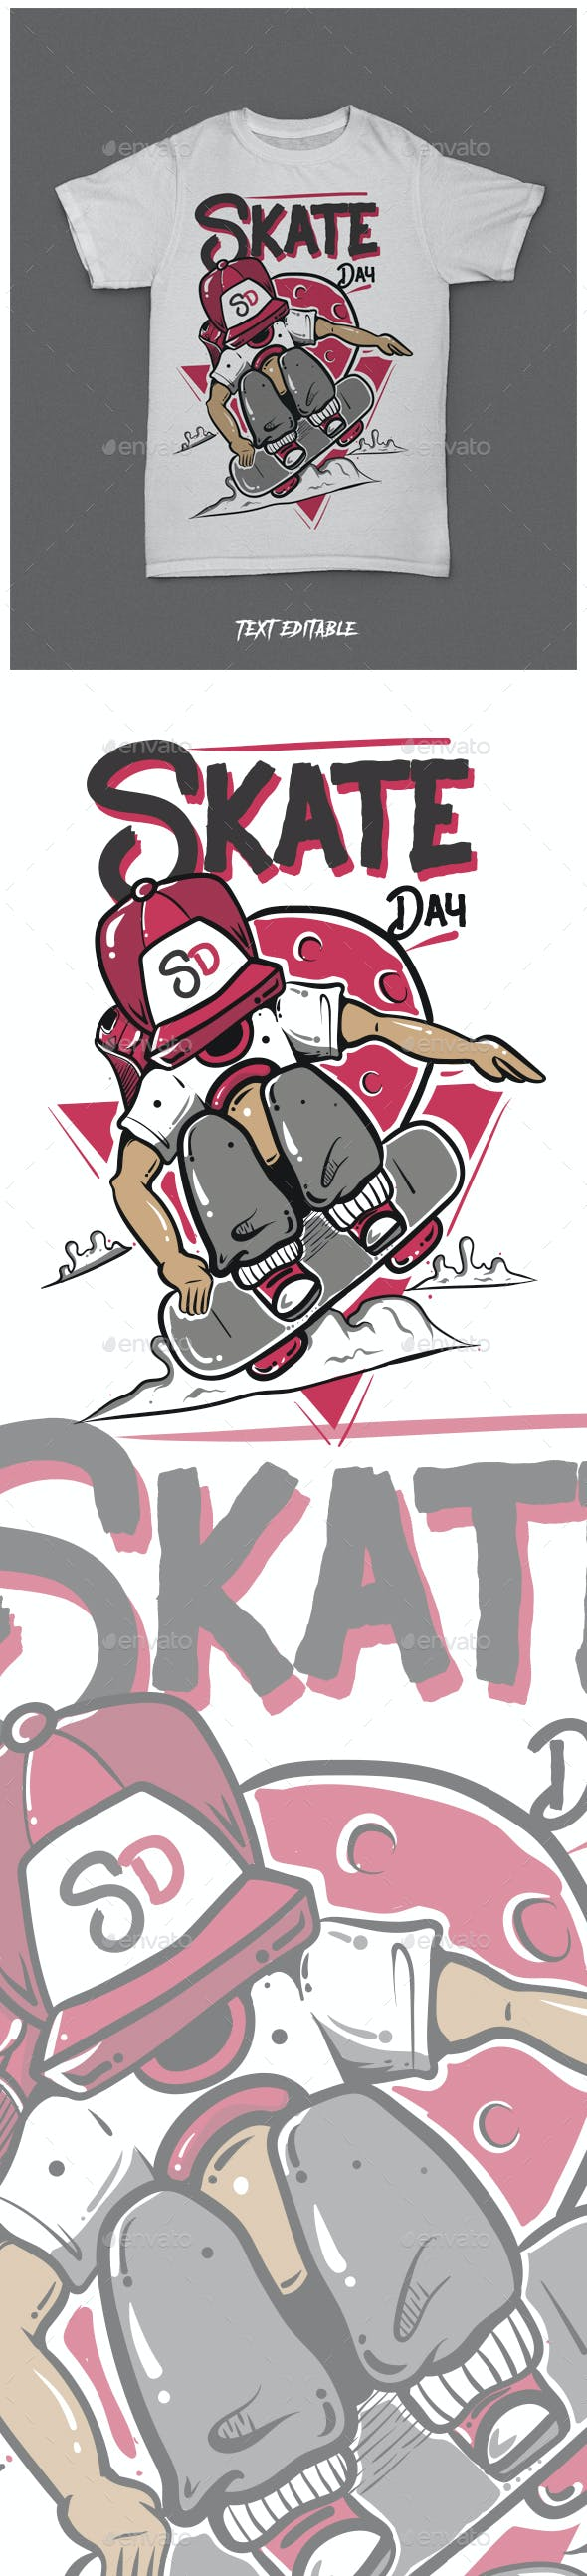 SkateBoard Day Tshirt Clothing